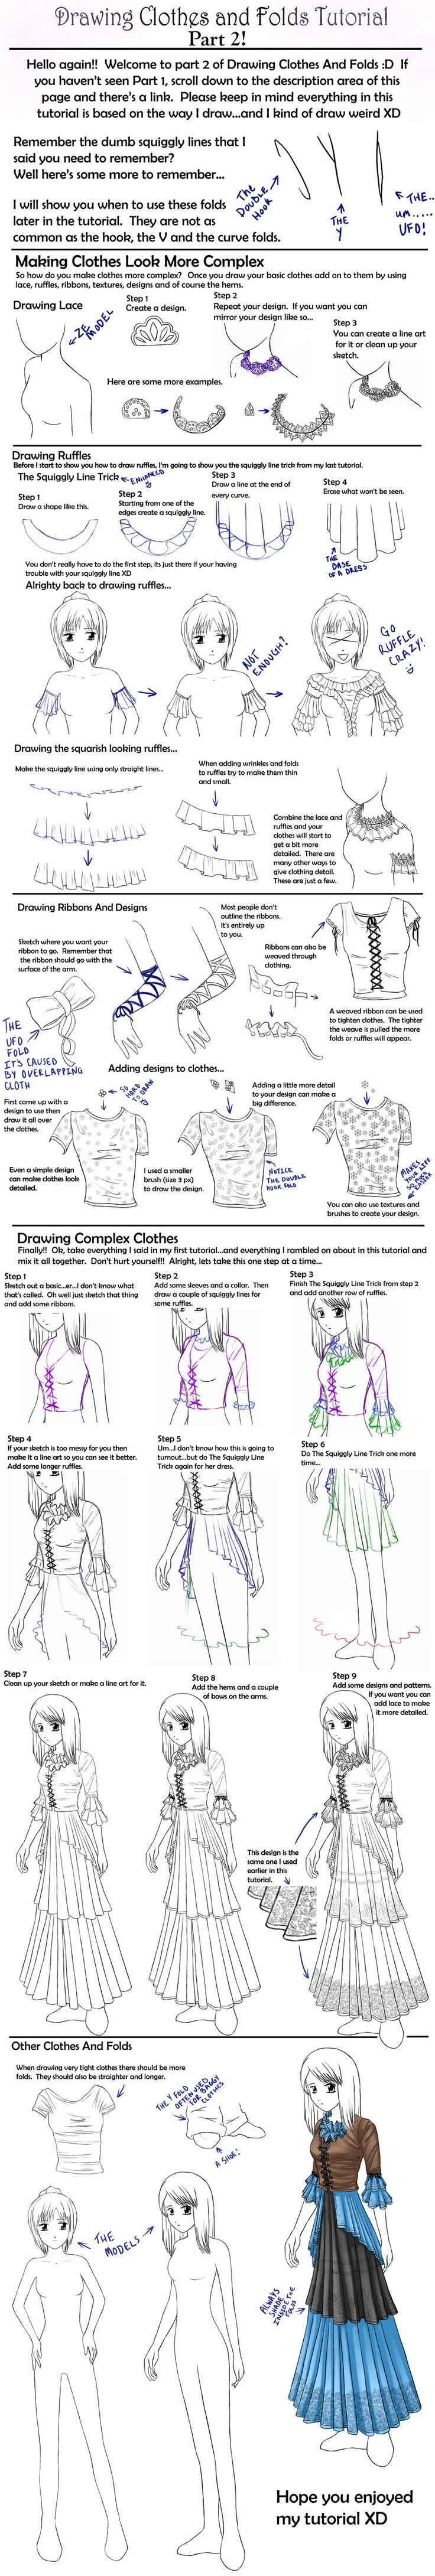 How to draw Clothes tutorial,Manga clothes, Anime Clothes, how to draw fabric, drawing folds, kawaii, girl, Japanese, anime, manga tut Fabric, folds, Japanese fashion